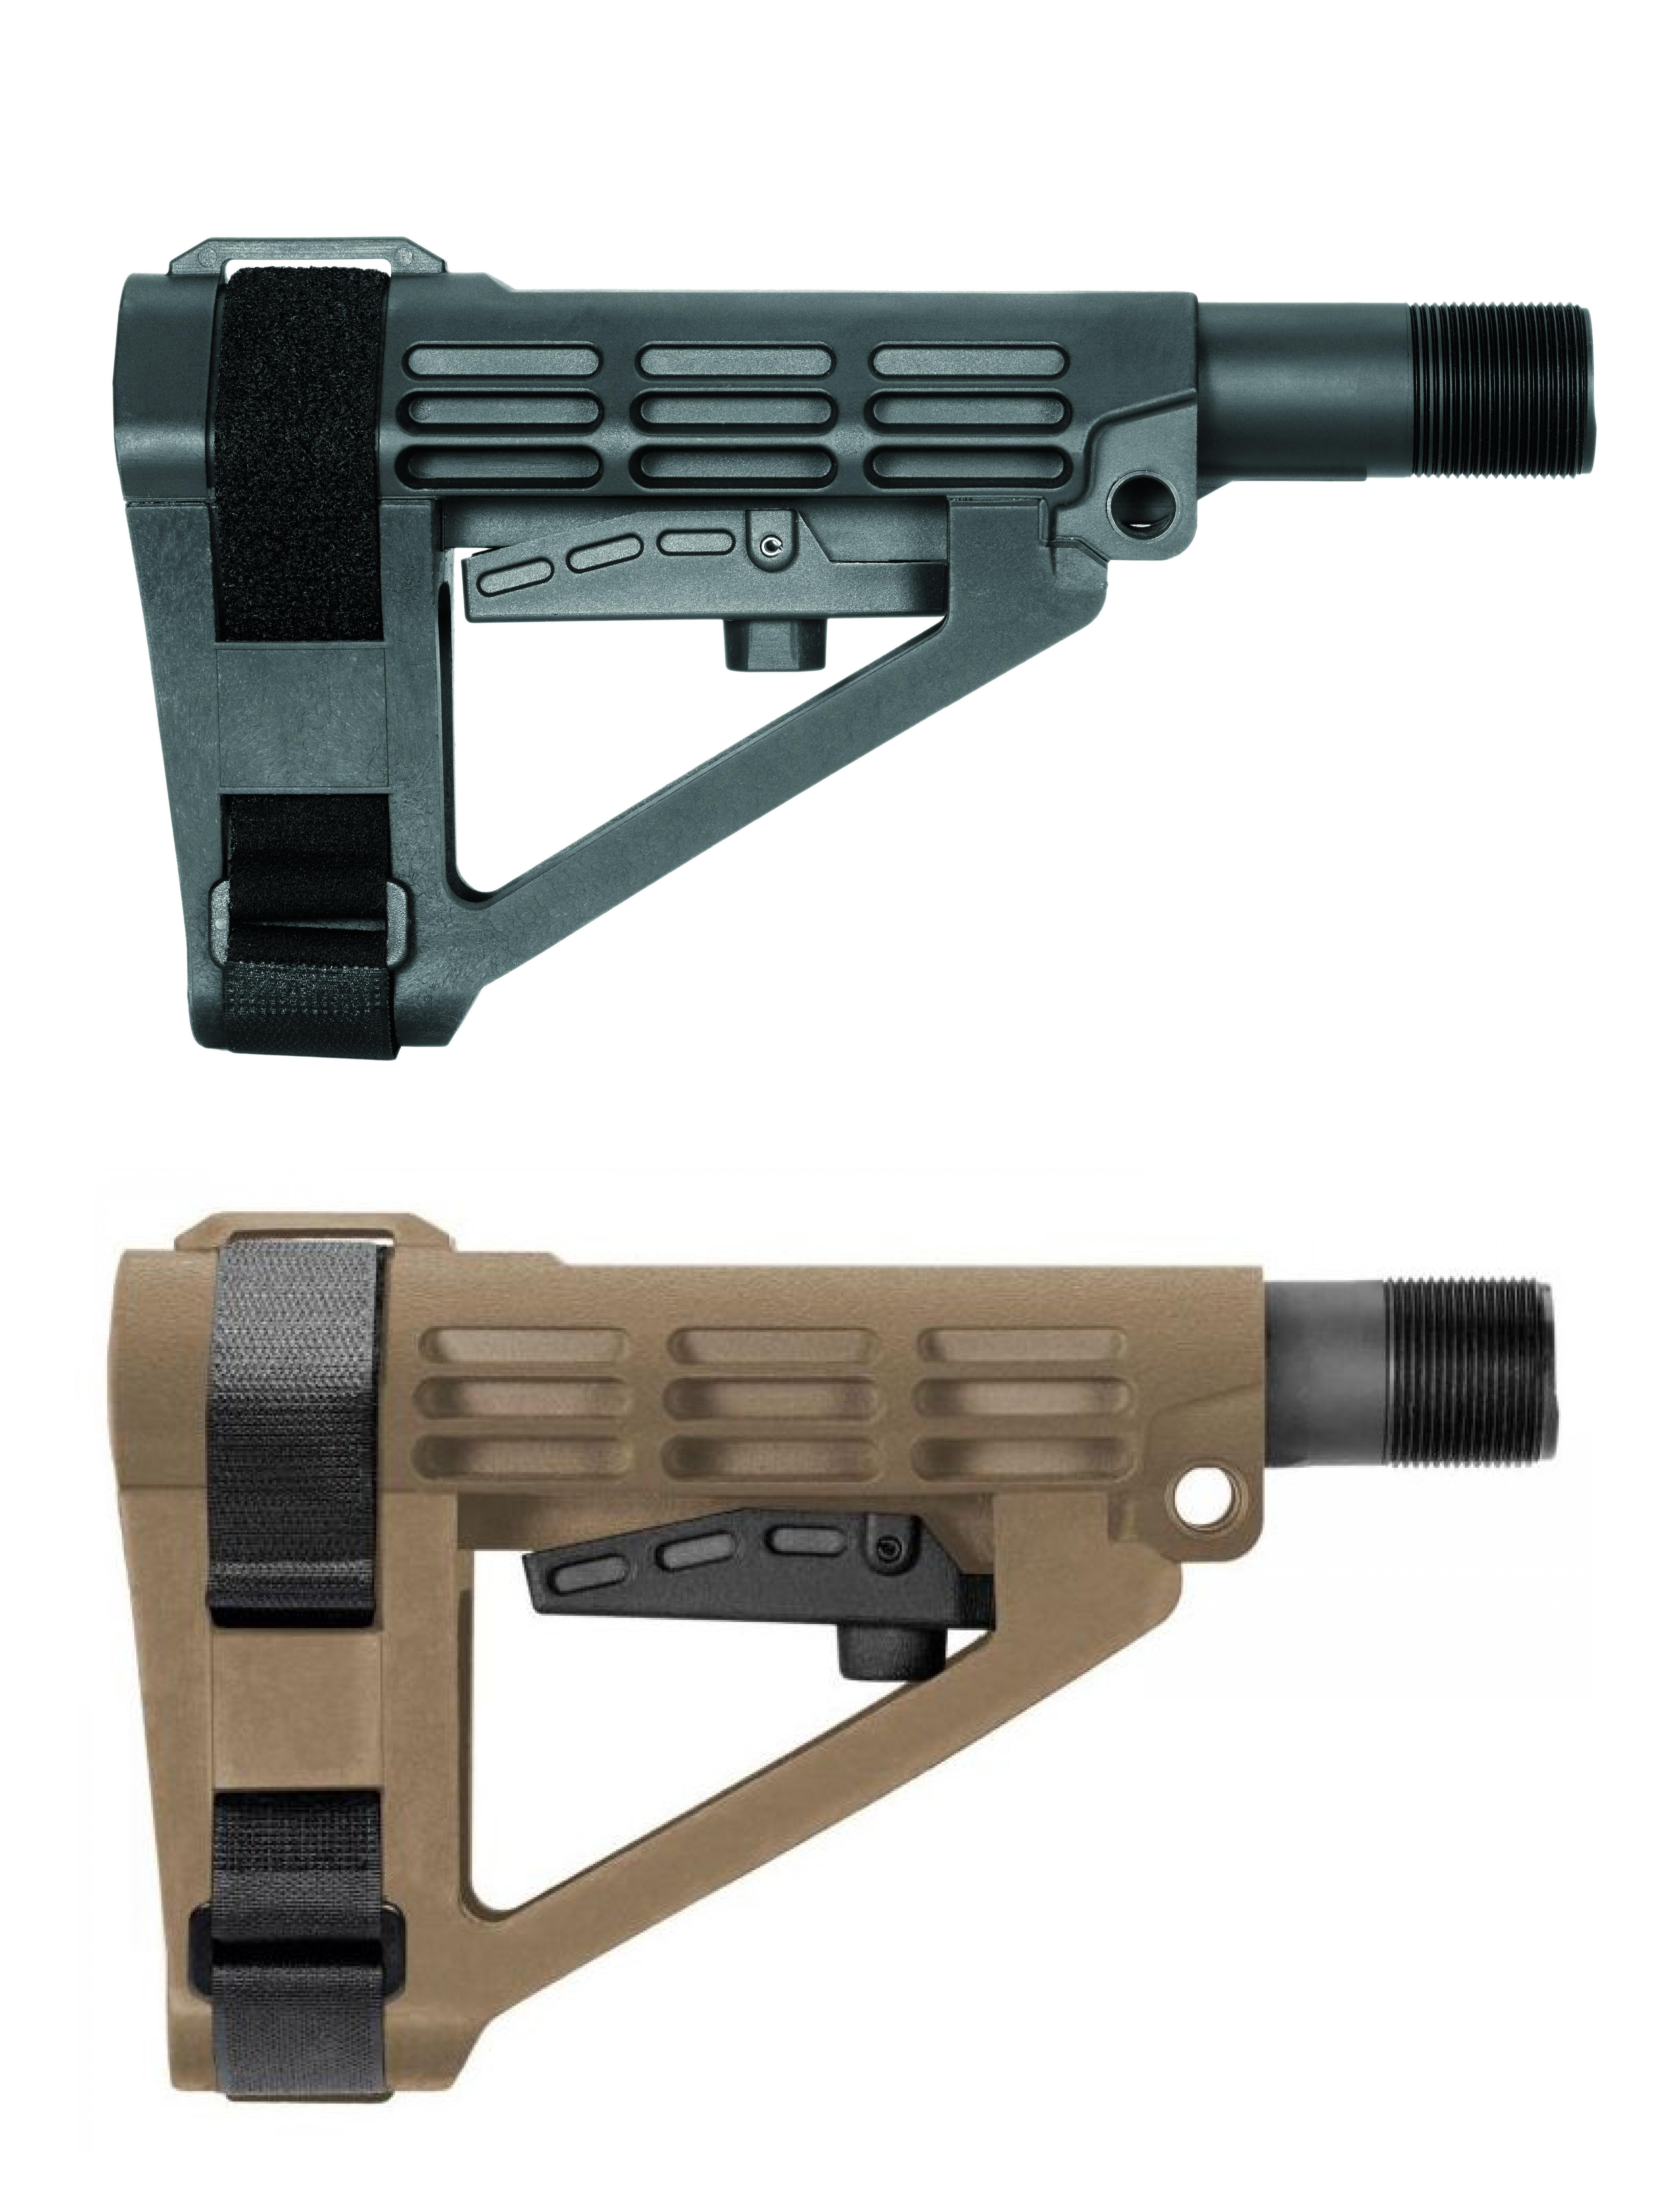 SB Tactical SBA4 Stabilizing Brace for Mil-Spec Carbine Extension Platforms